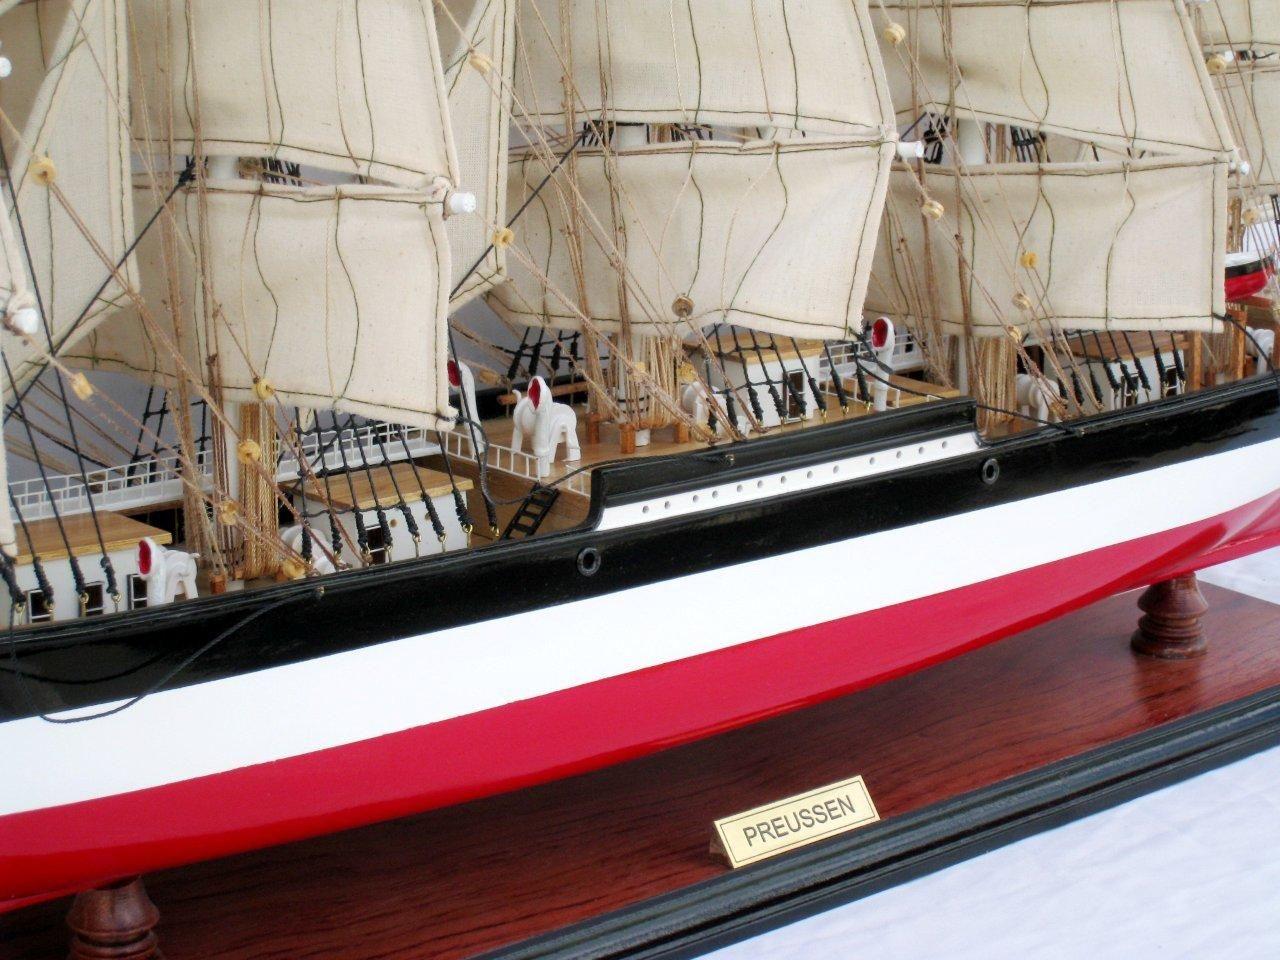 2086-12582-Preussen-Model-Boat